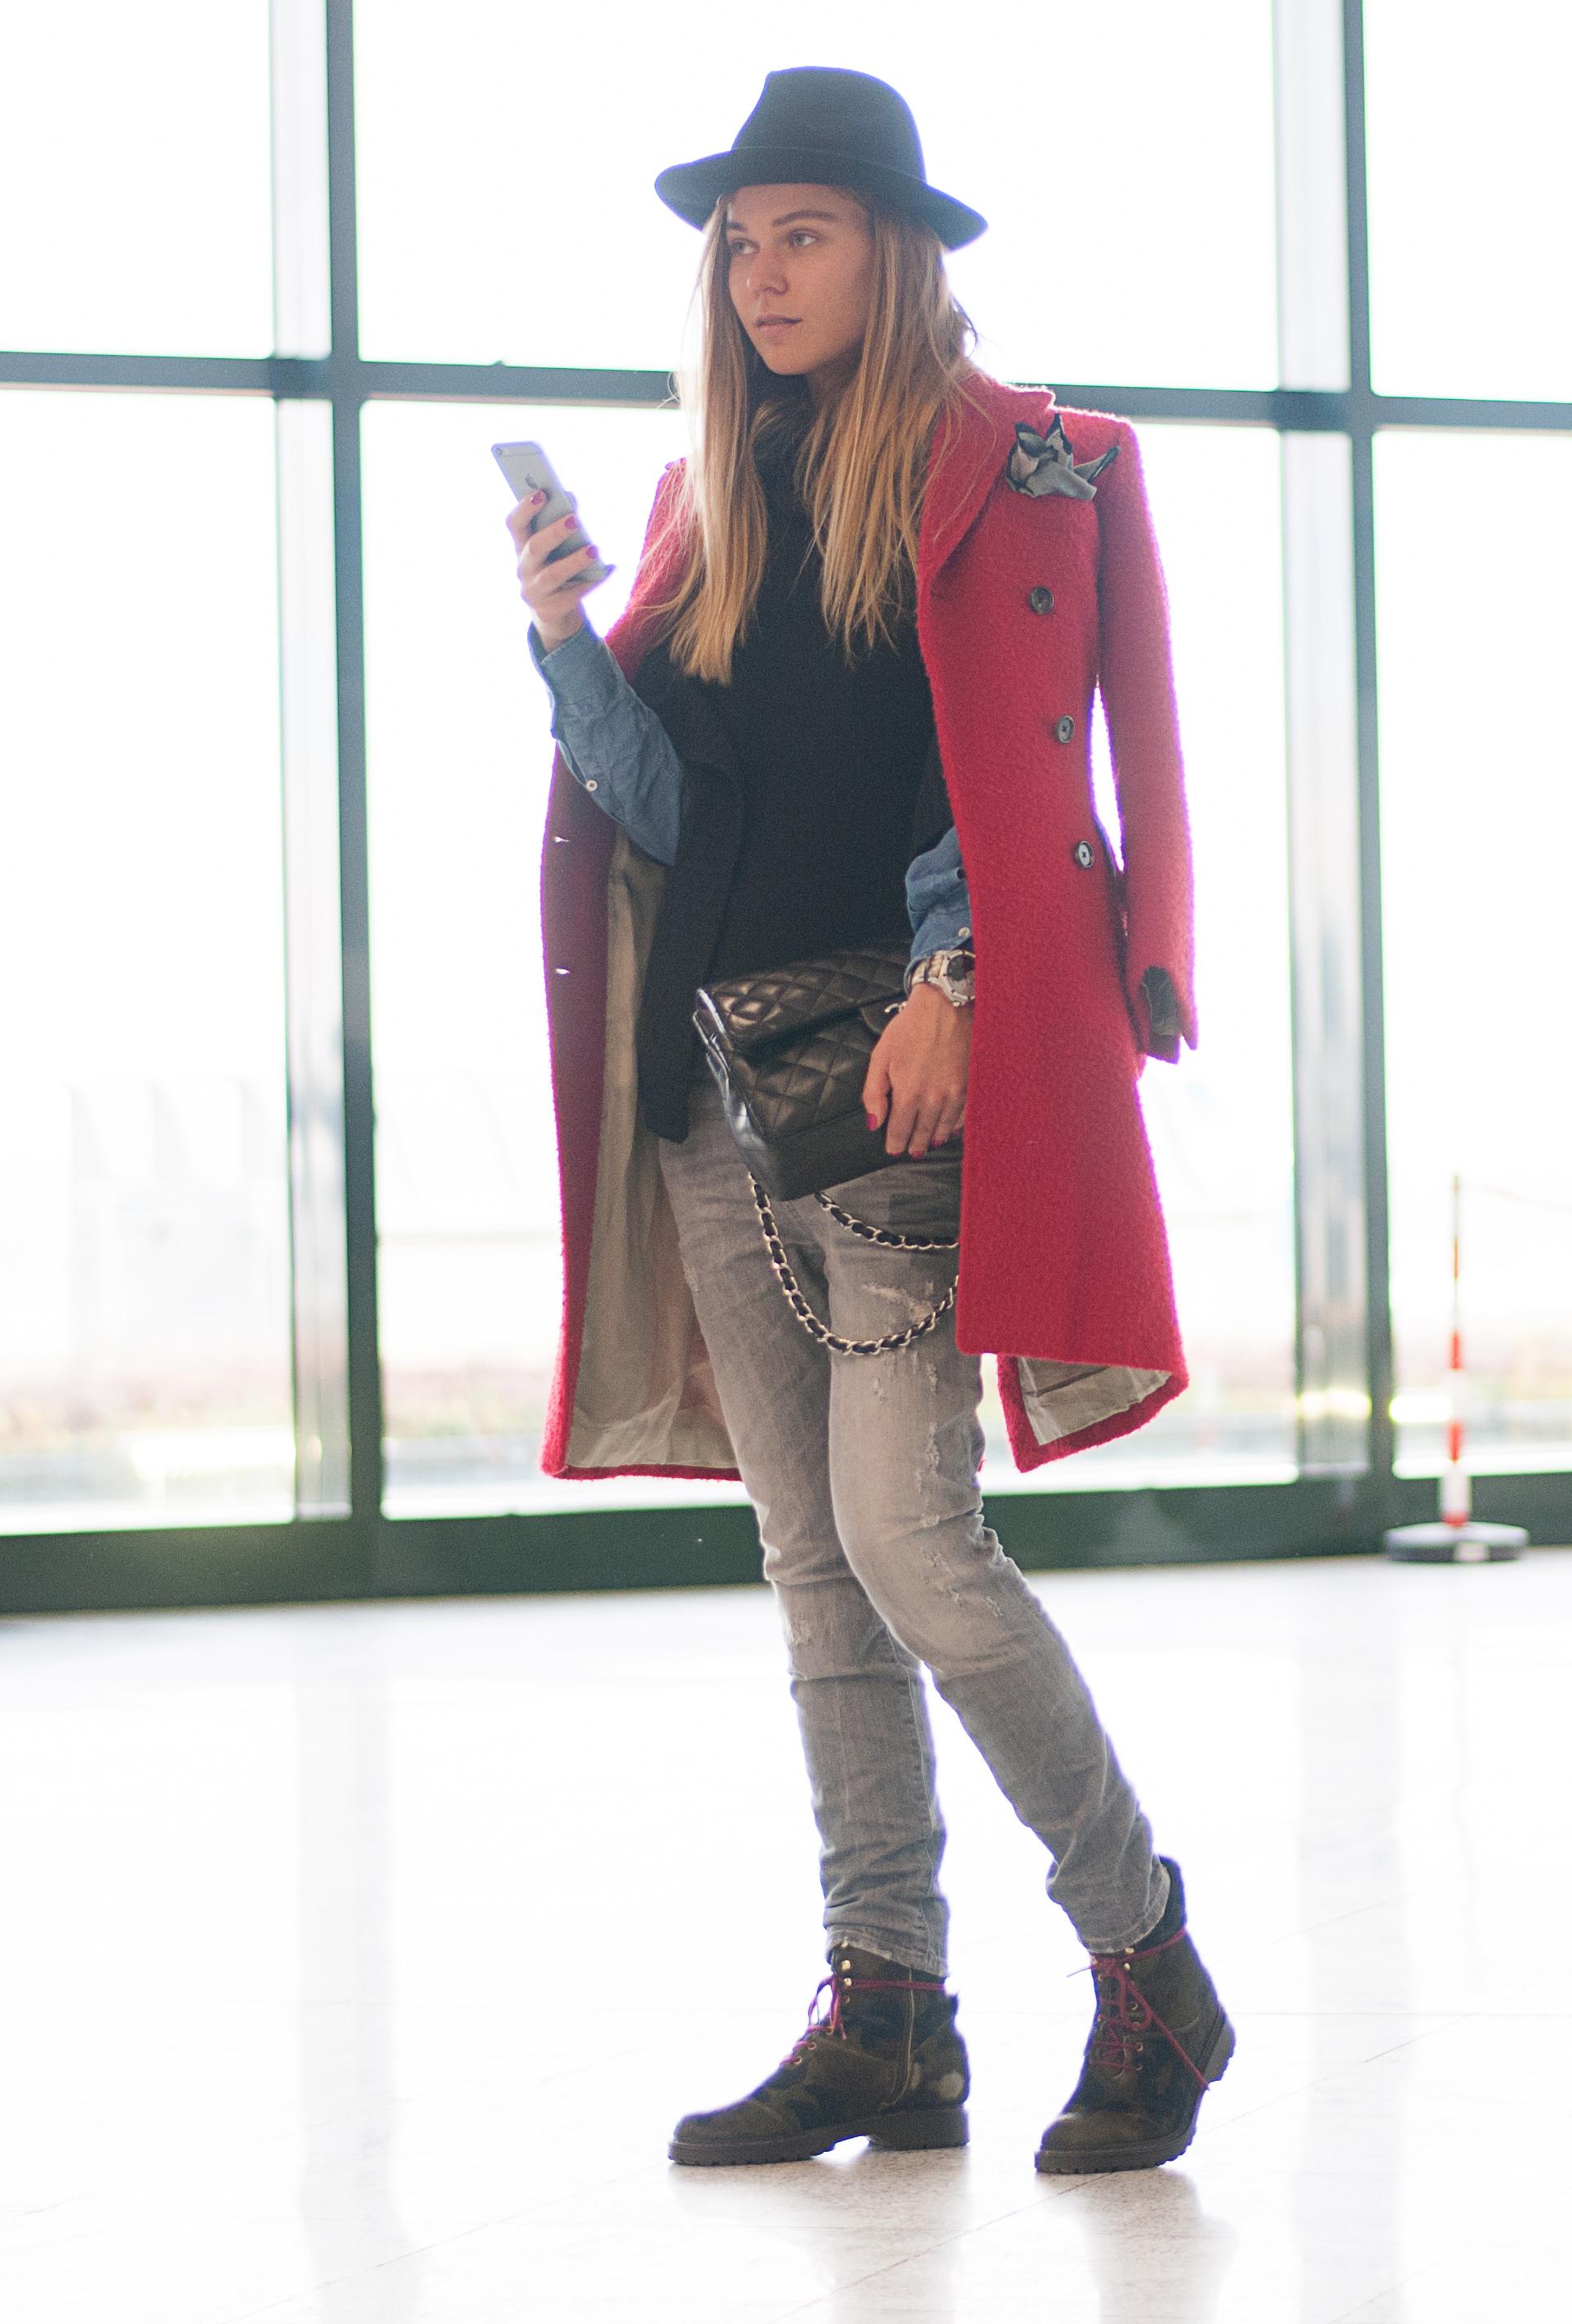 svetlana shashkova in casantino red coat